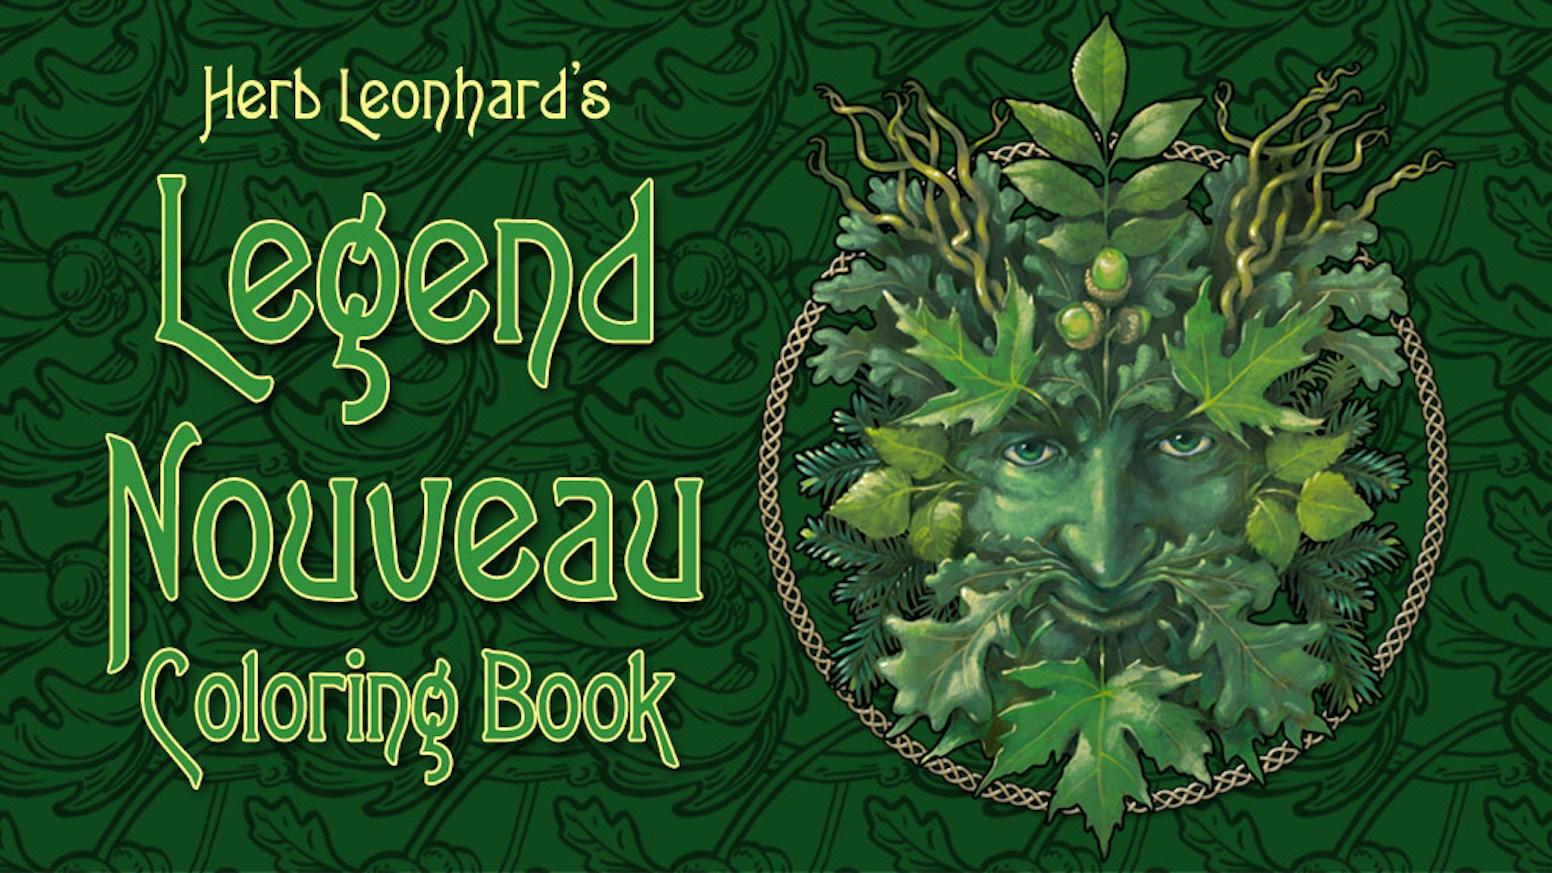 Legend Nouveau Coloring Book by Herb Leonhard — Kickstarter